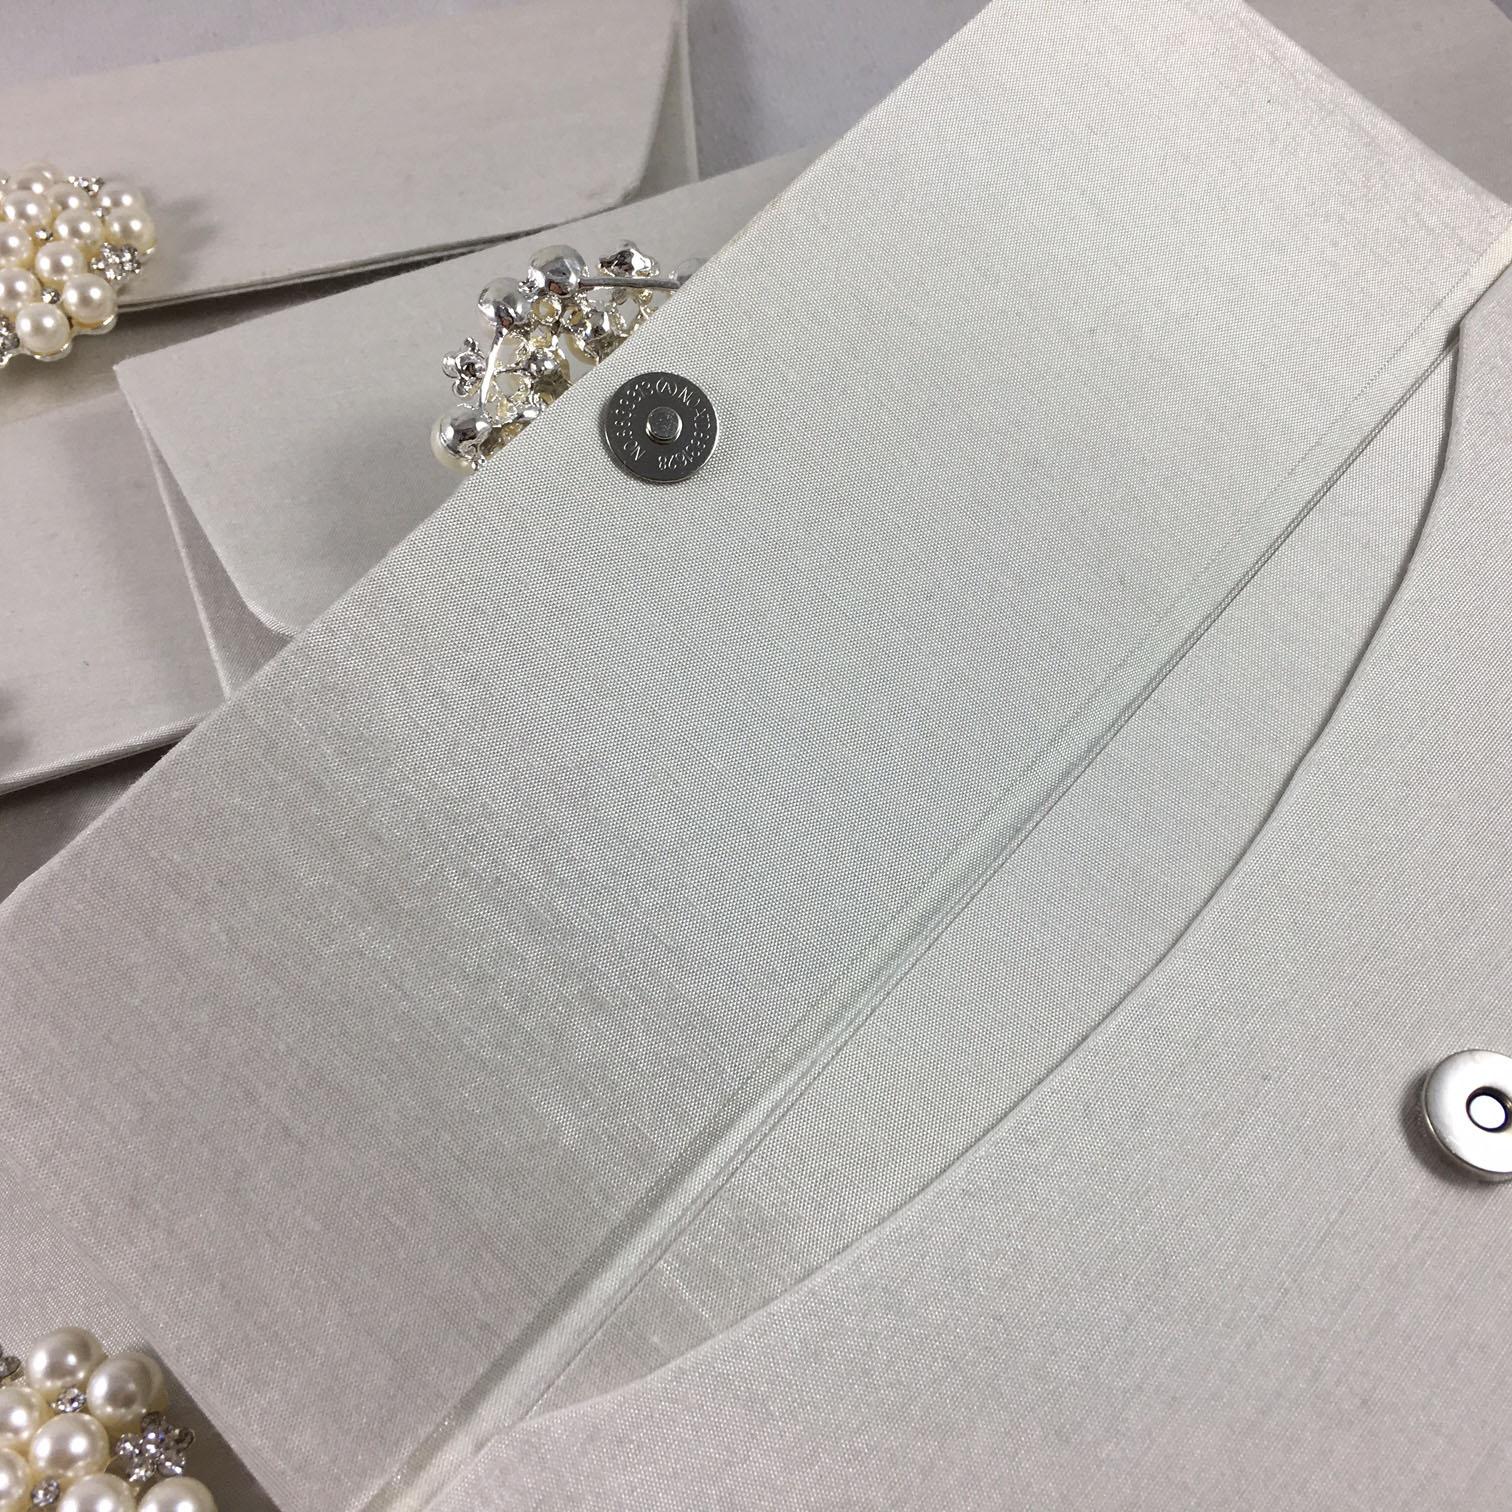 ivory wedding envelope with pearl brooch